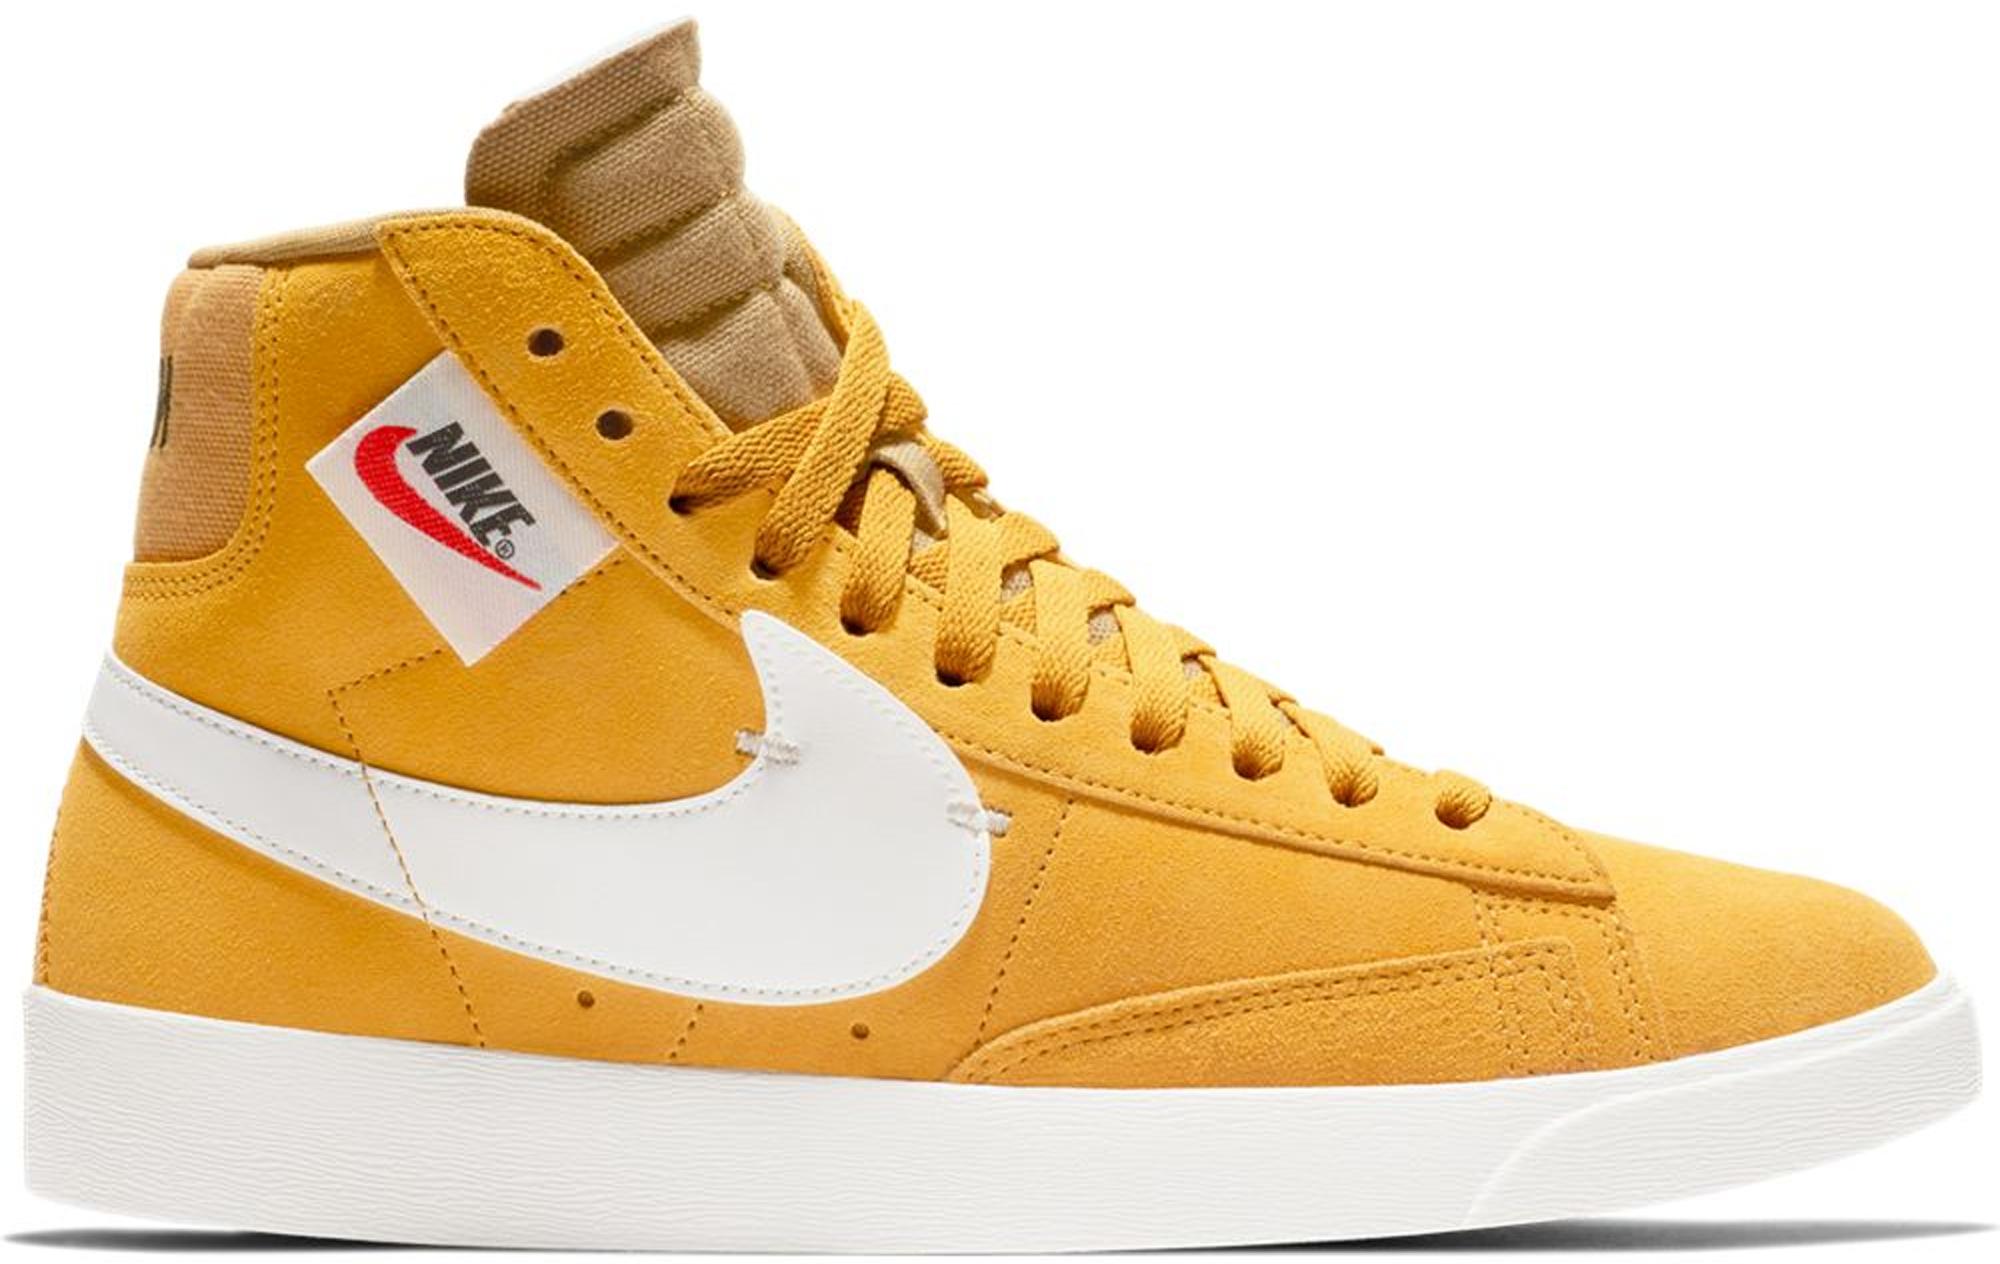 Nike Blazer Mid Rebel Yellow Ochre (W